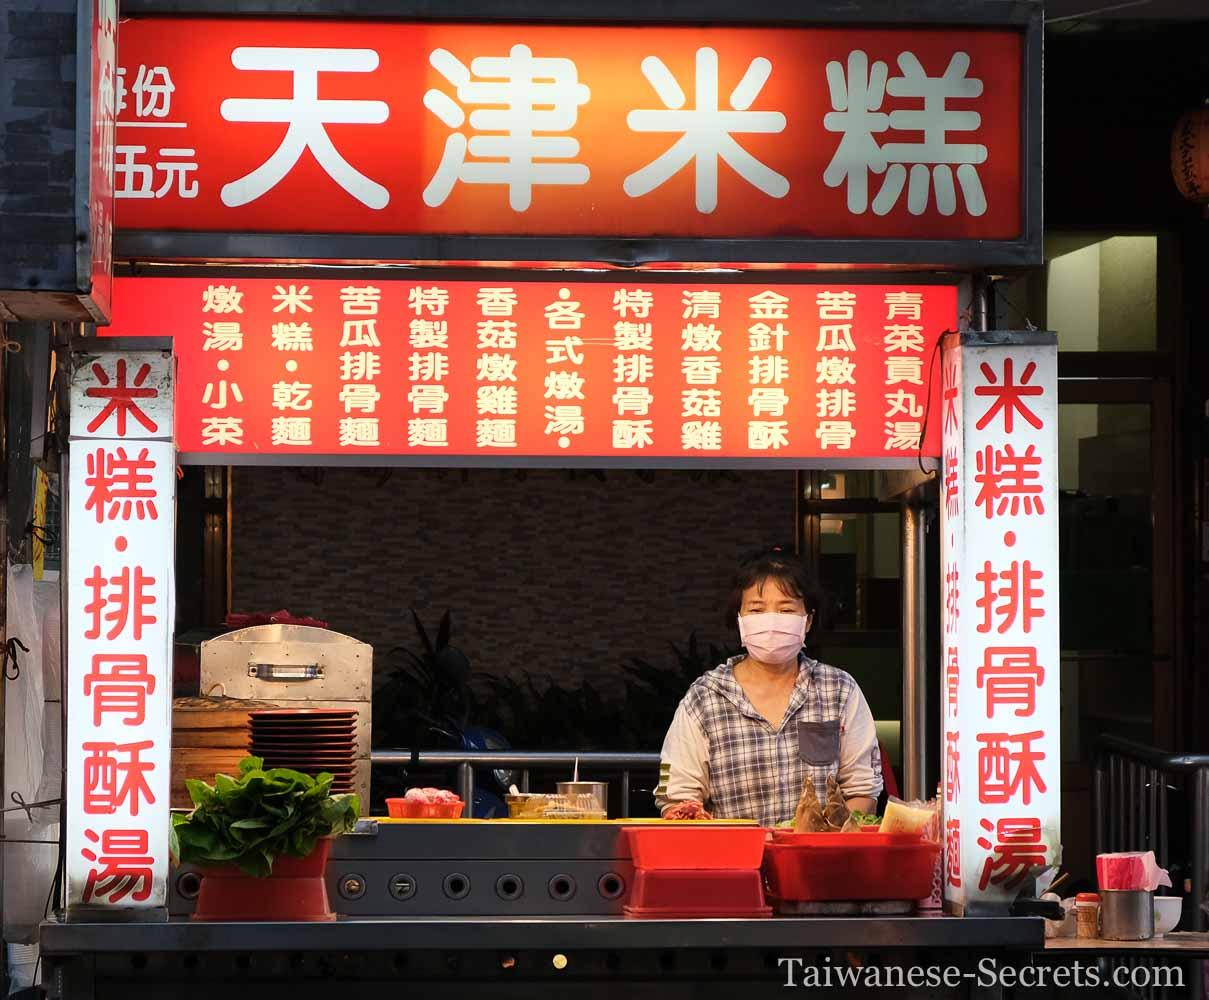 zhonghua road night market